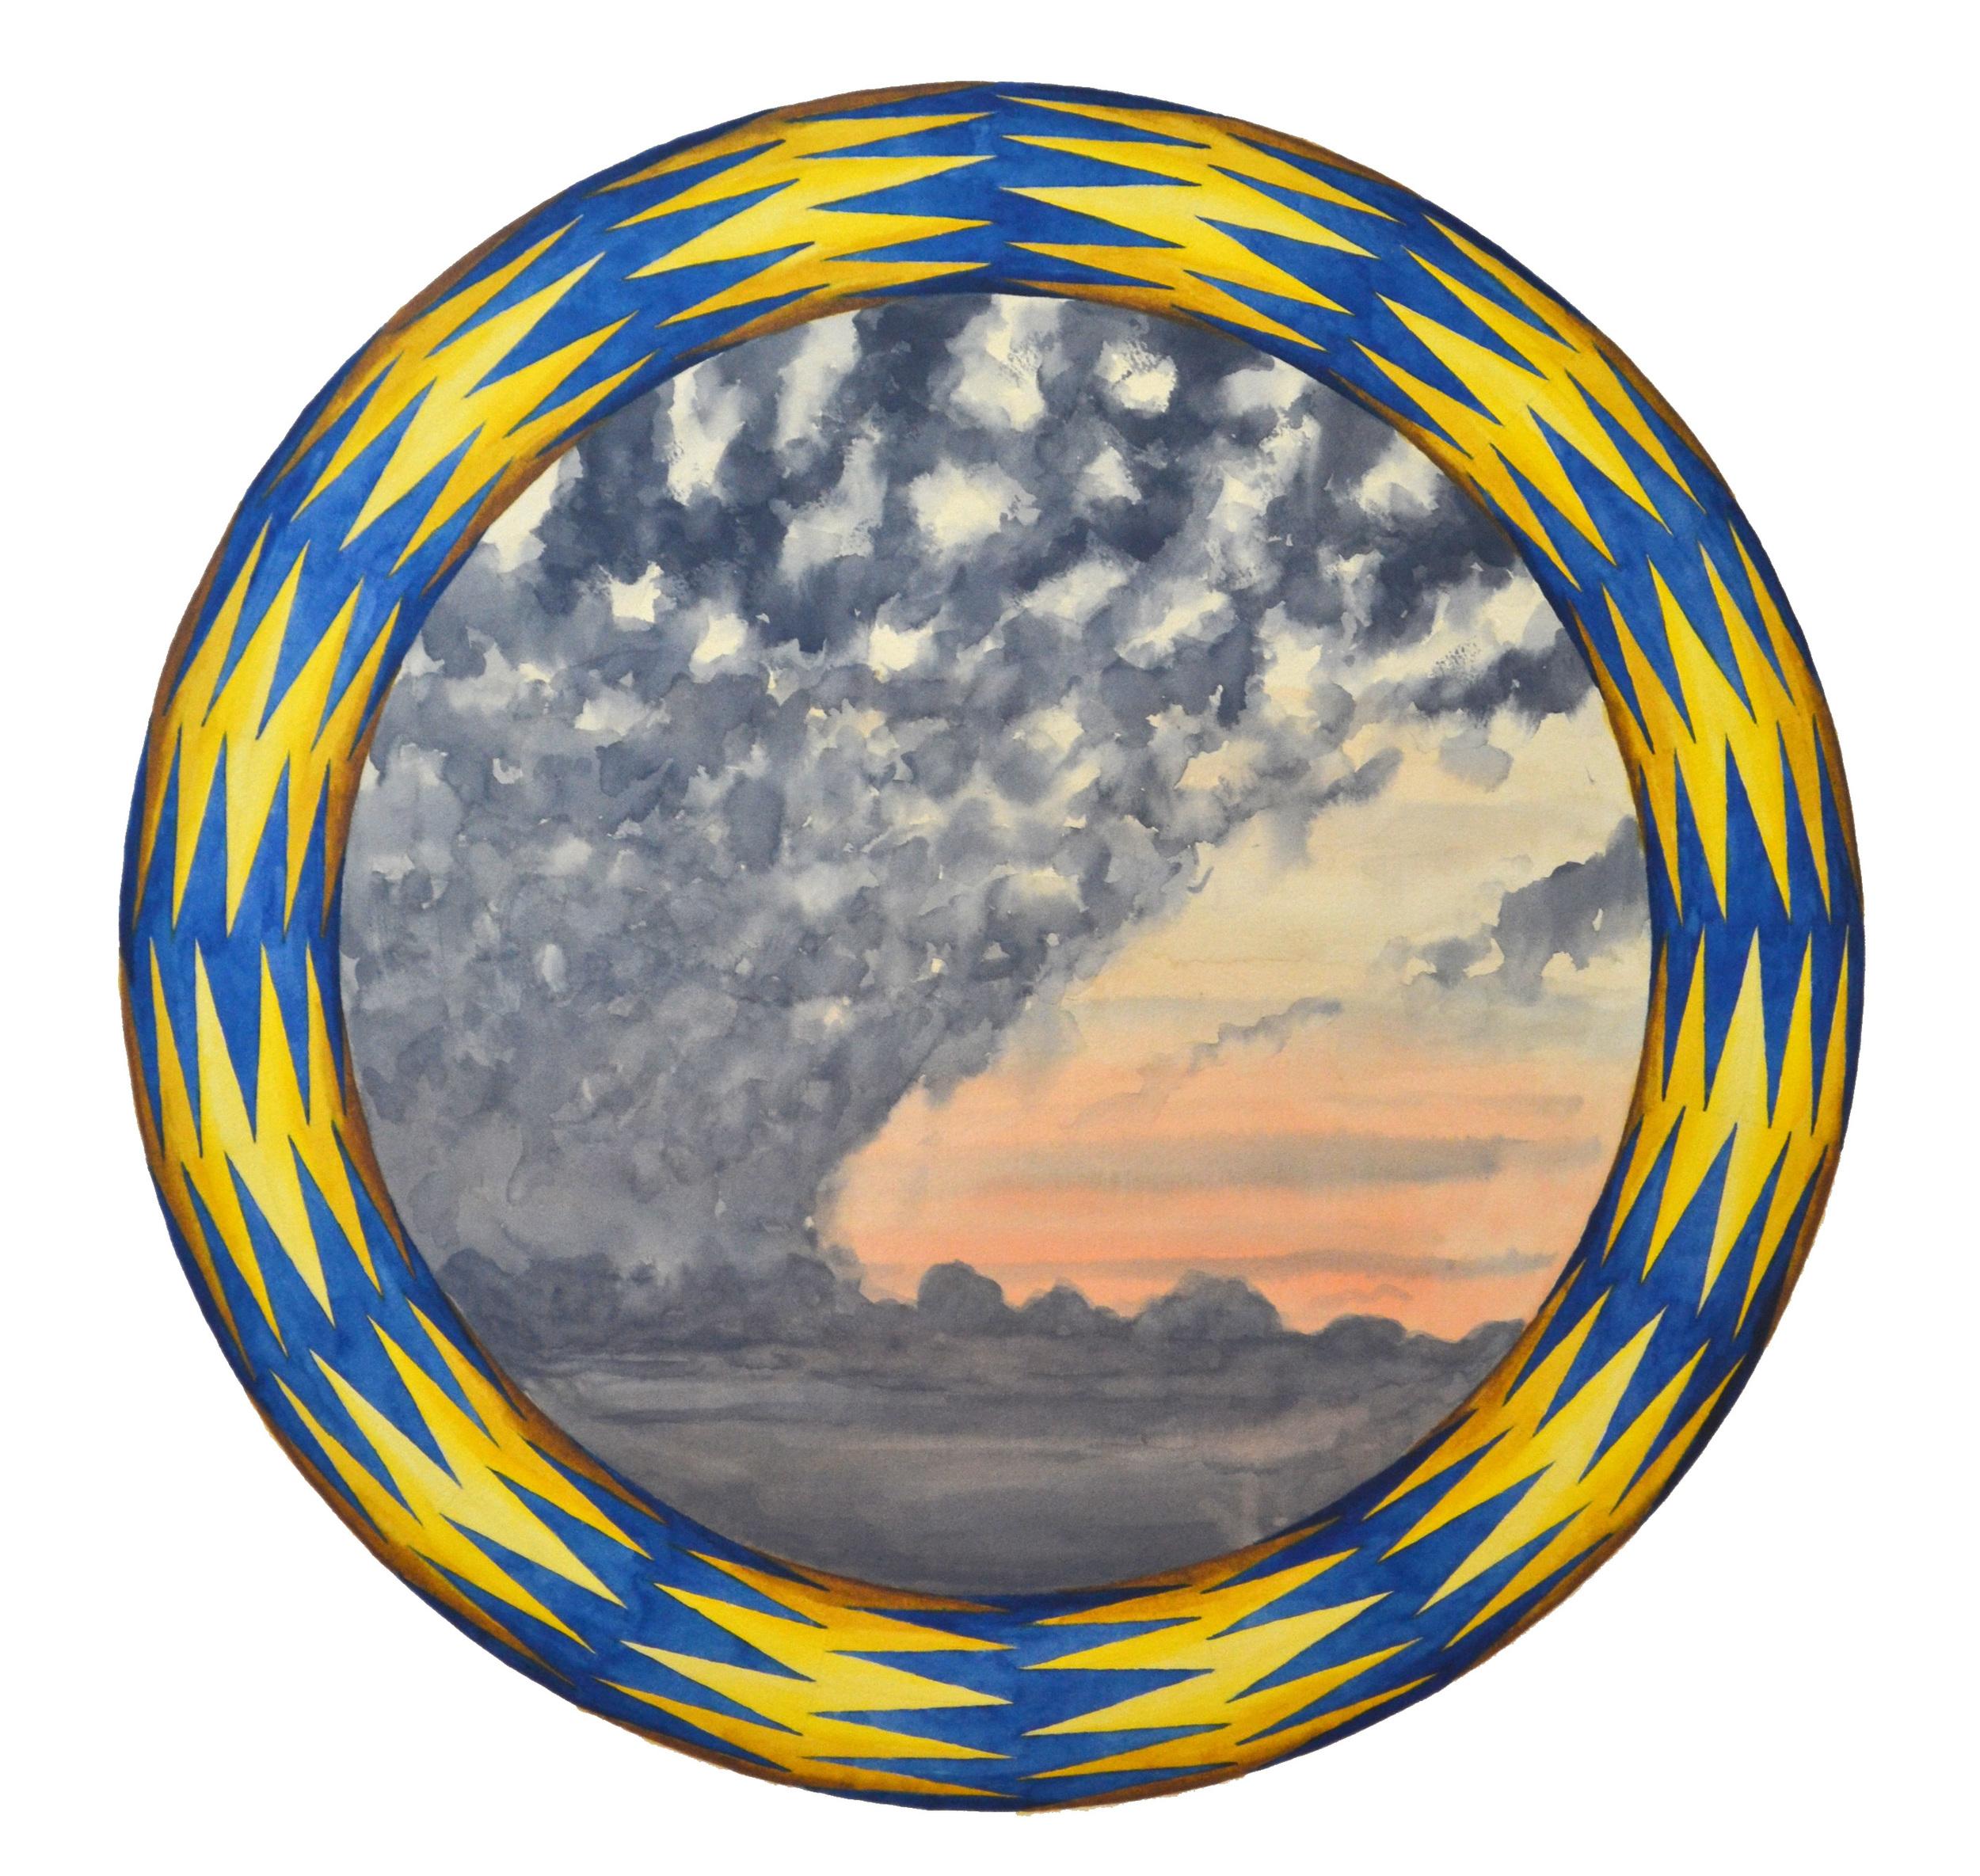 Planet VI